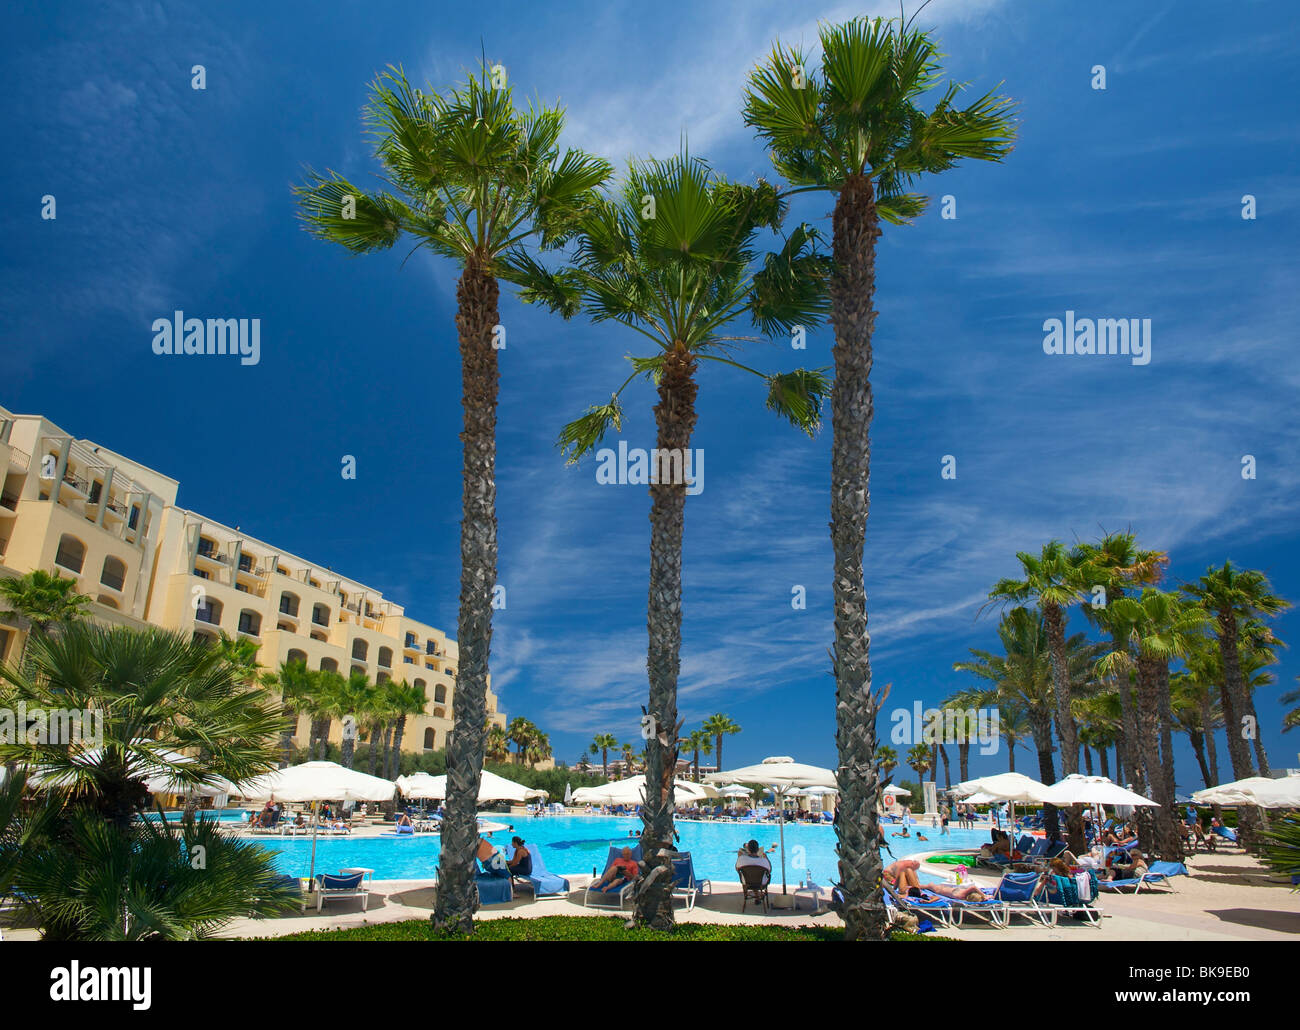 Hilton Hotel in St. Julians, Malta, Europe Stock Photo